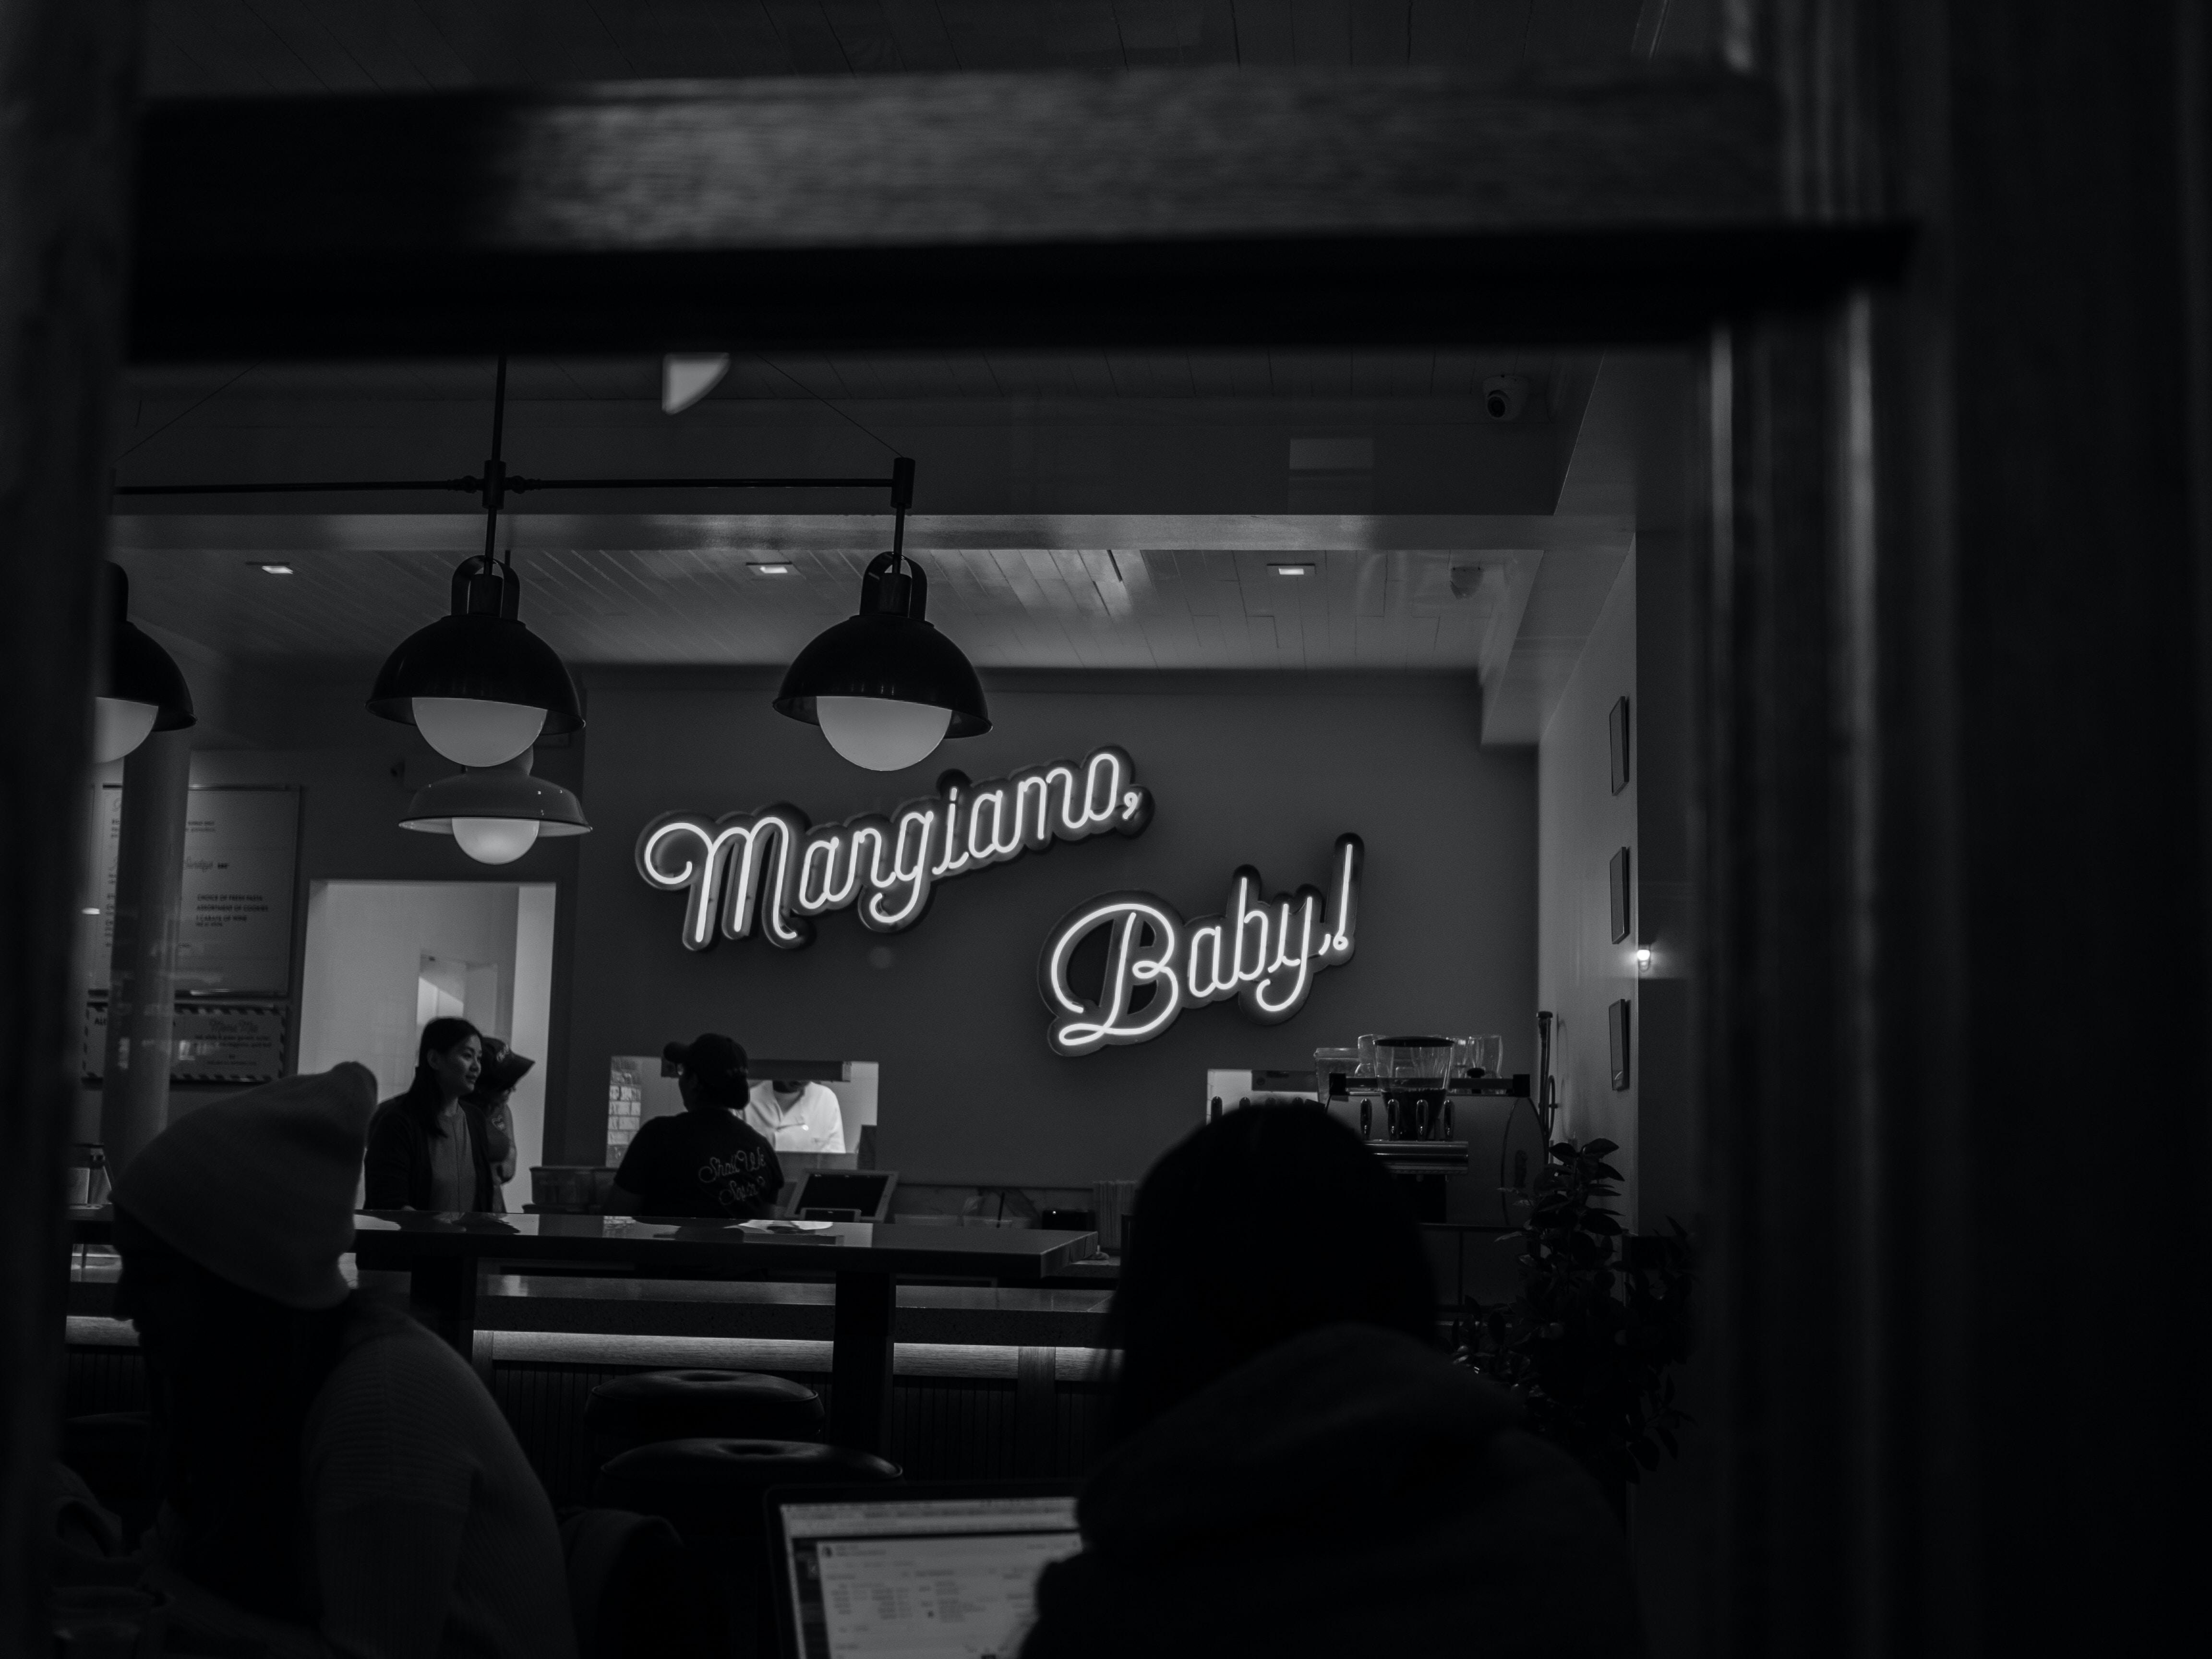 grayscale photography of Margiamo Baby! neon sign